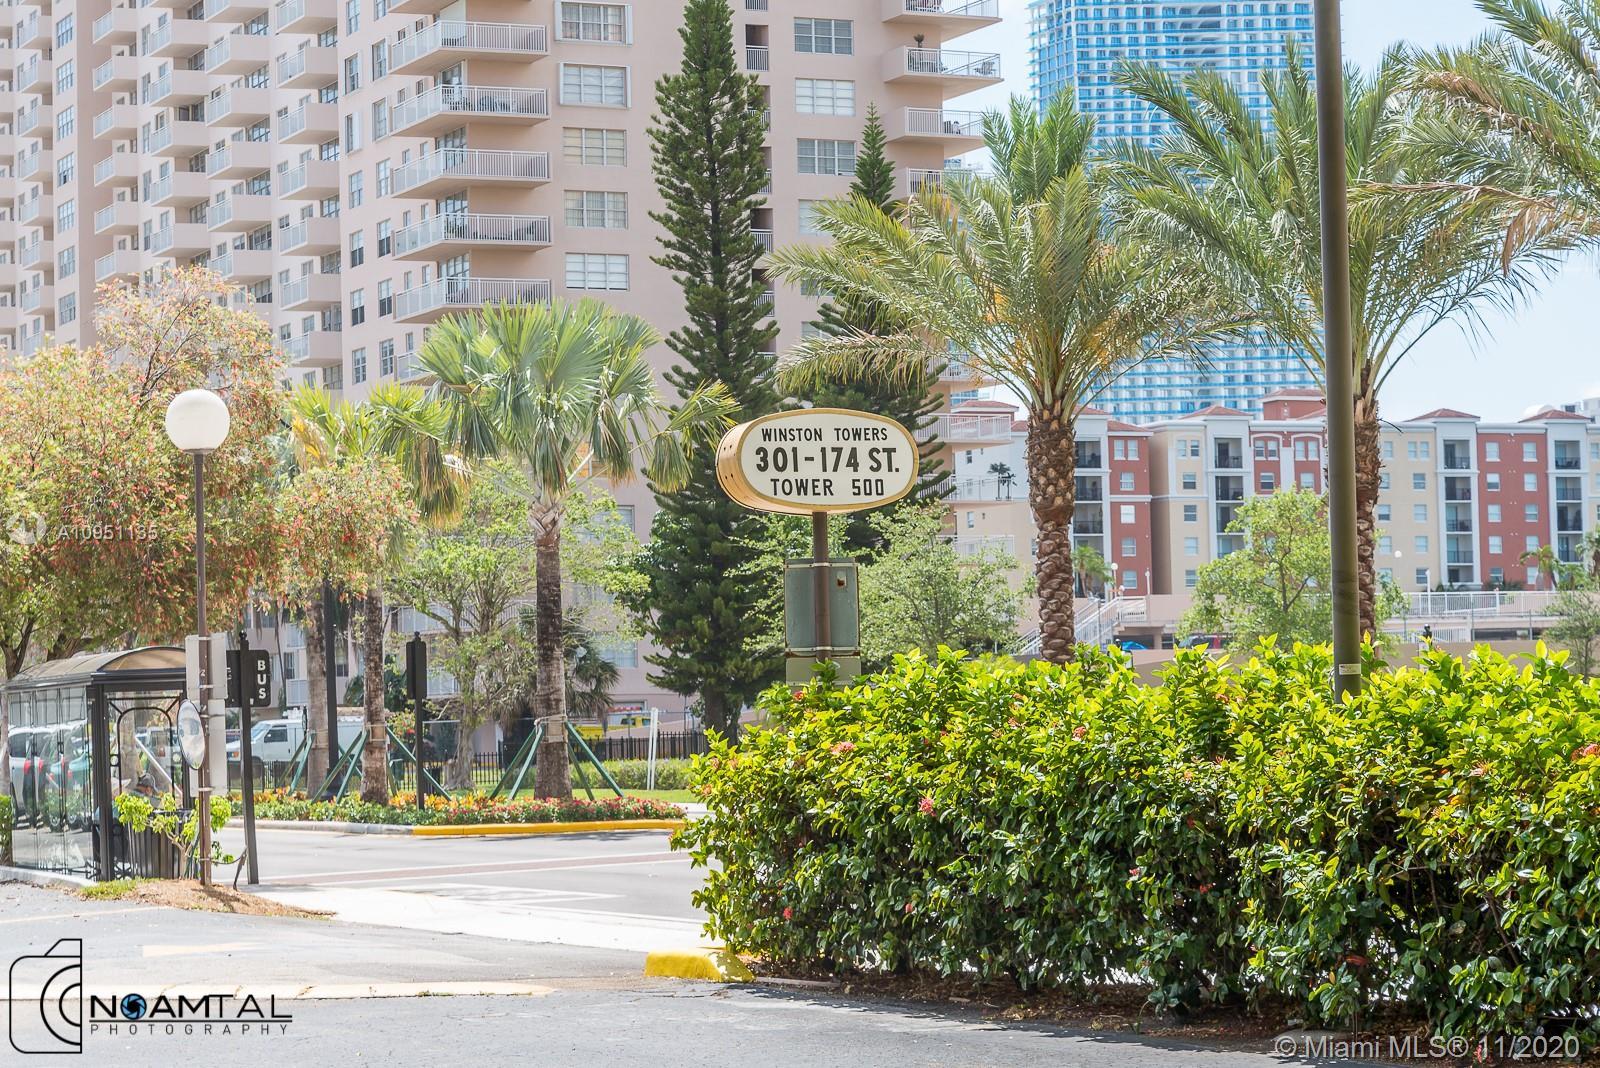 Winston Tower 500 #511 - 301 174th St #511, Sunny Isles Beach, FL 33160